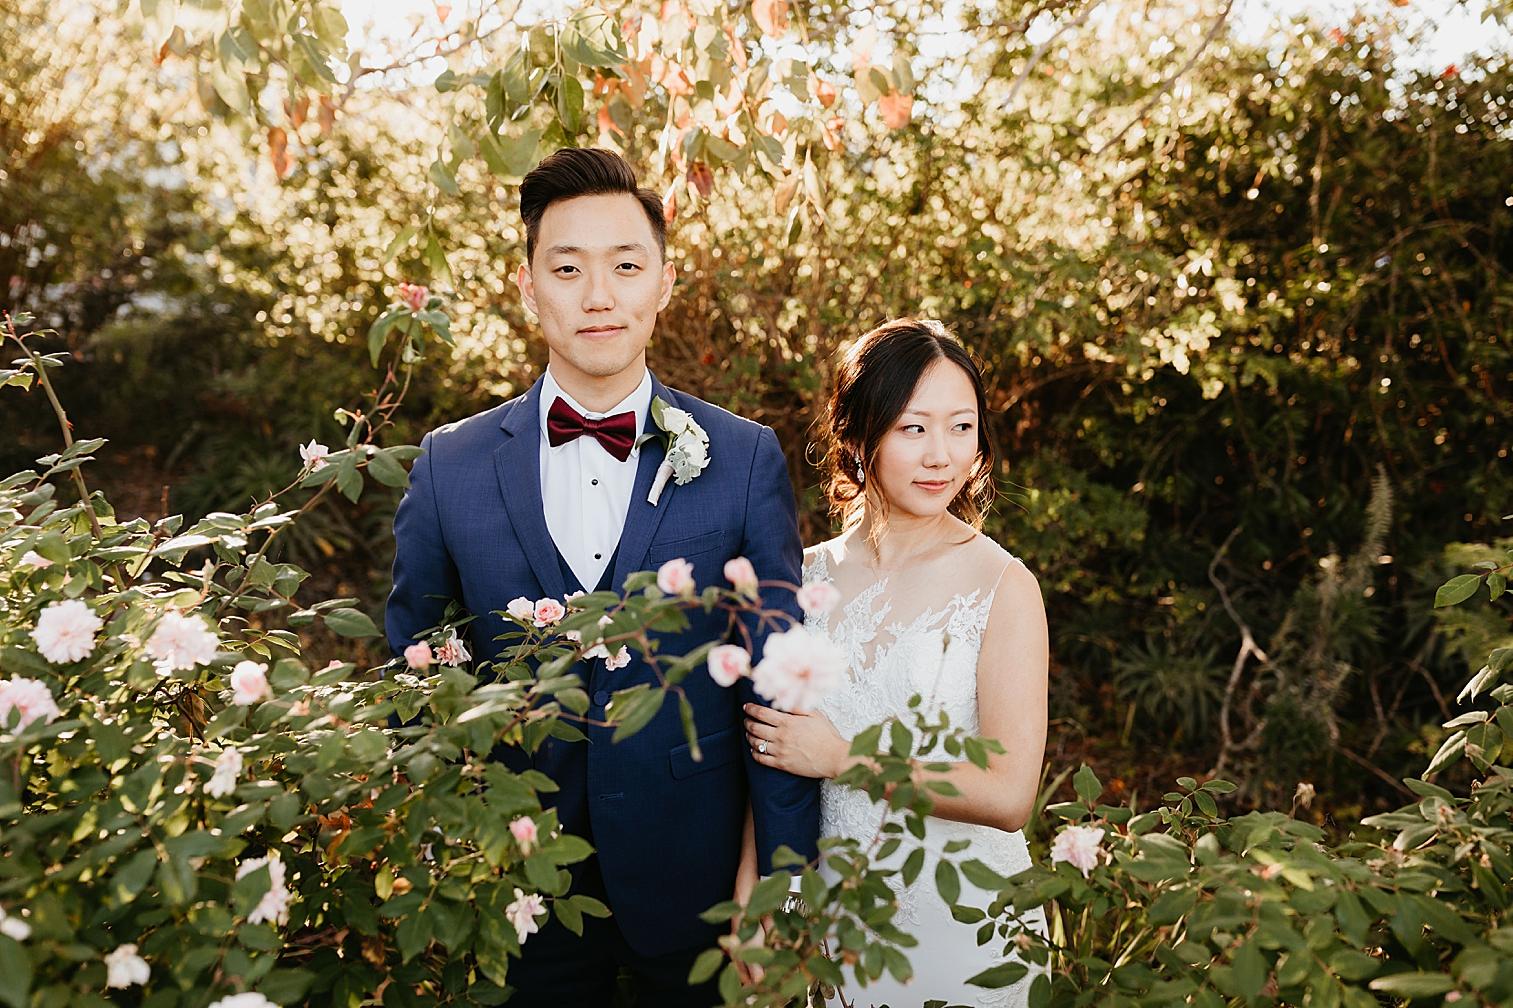 Secret-Garden-Rancho-Santa-Fe-Wedding-91.jpg